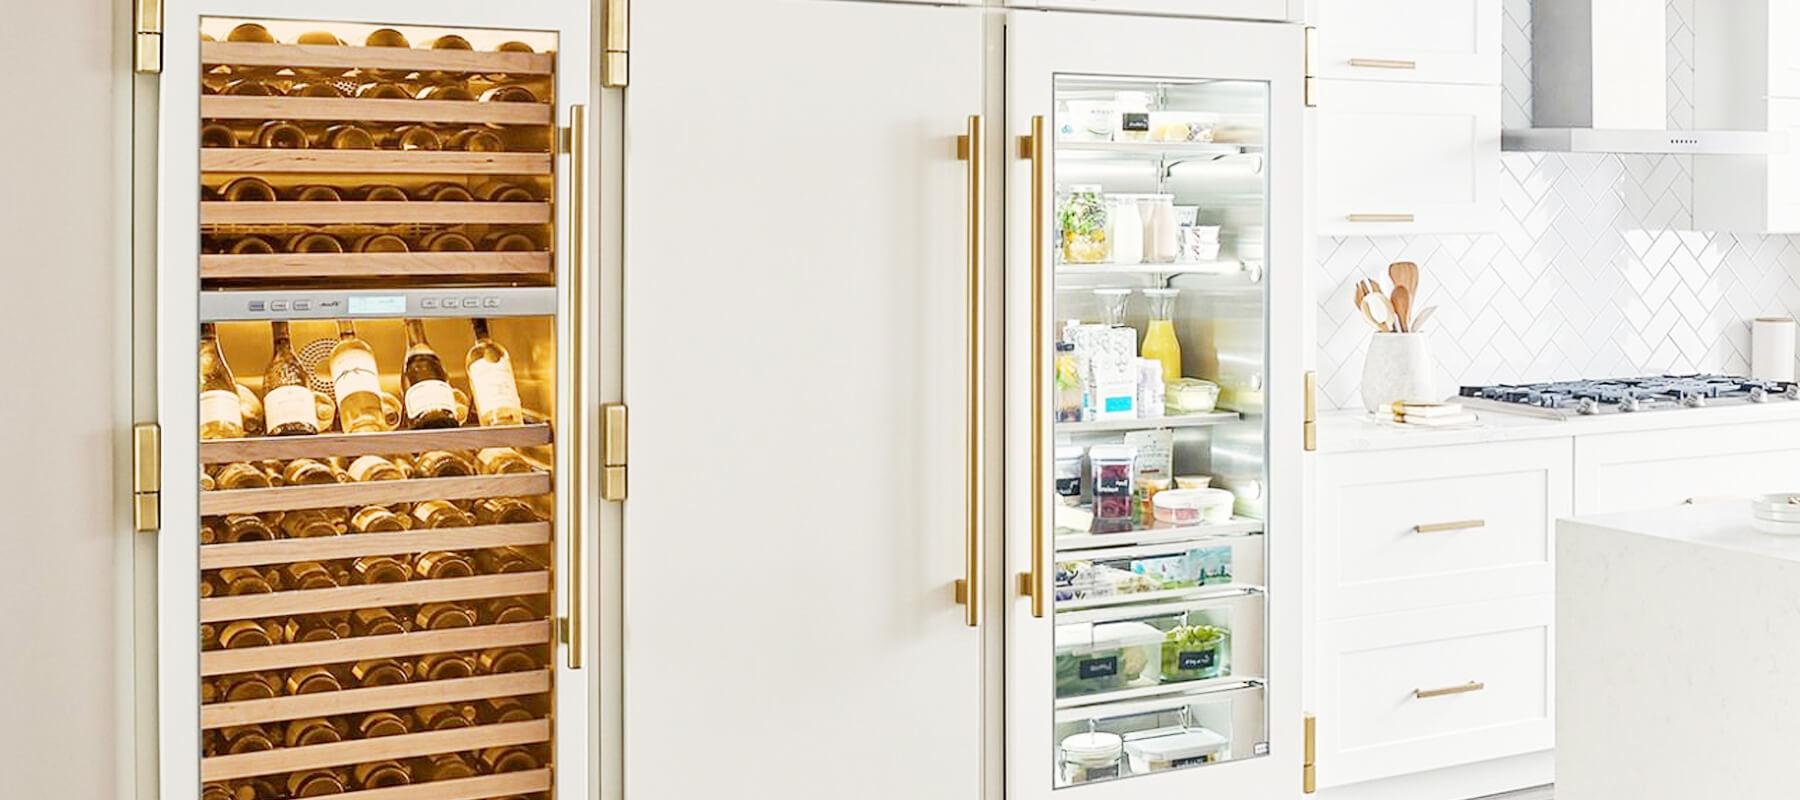 Built in Counter Depth Refrigerator Altadena | Built-in Refrigerator Repair